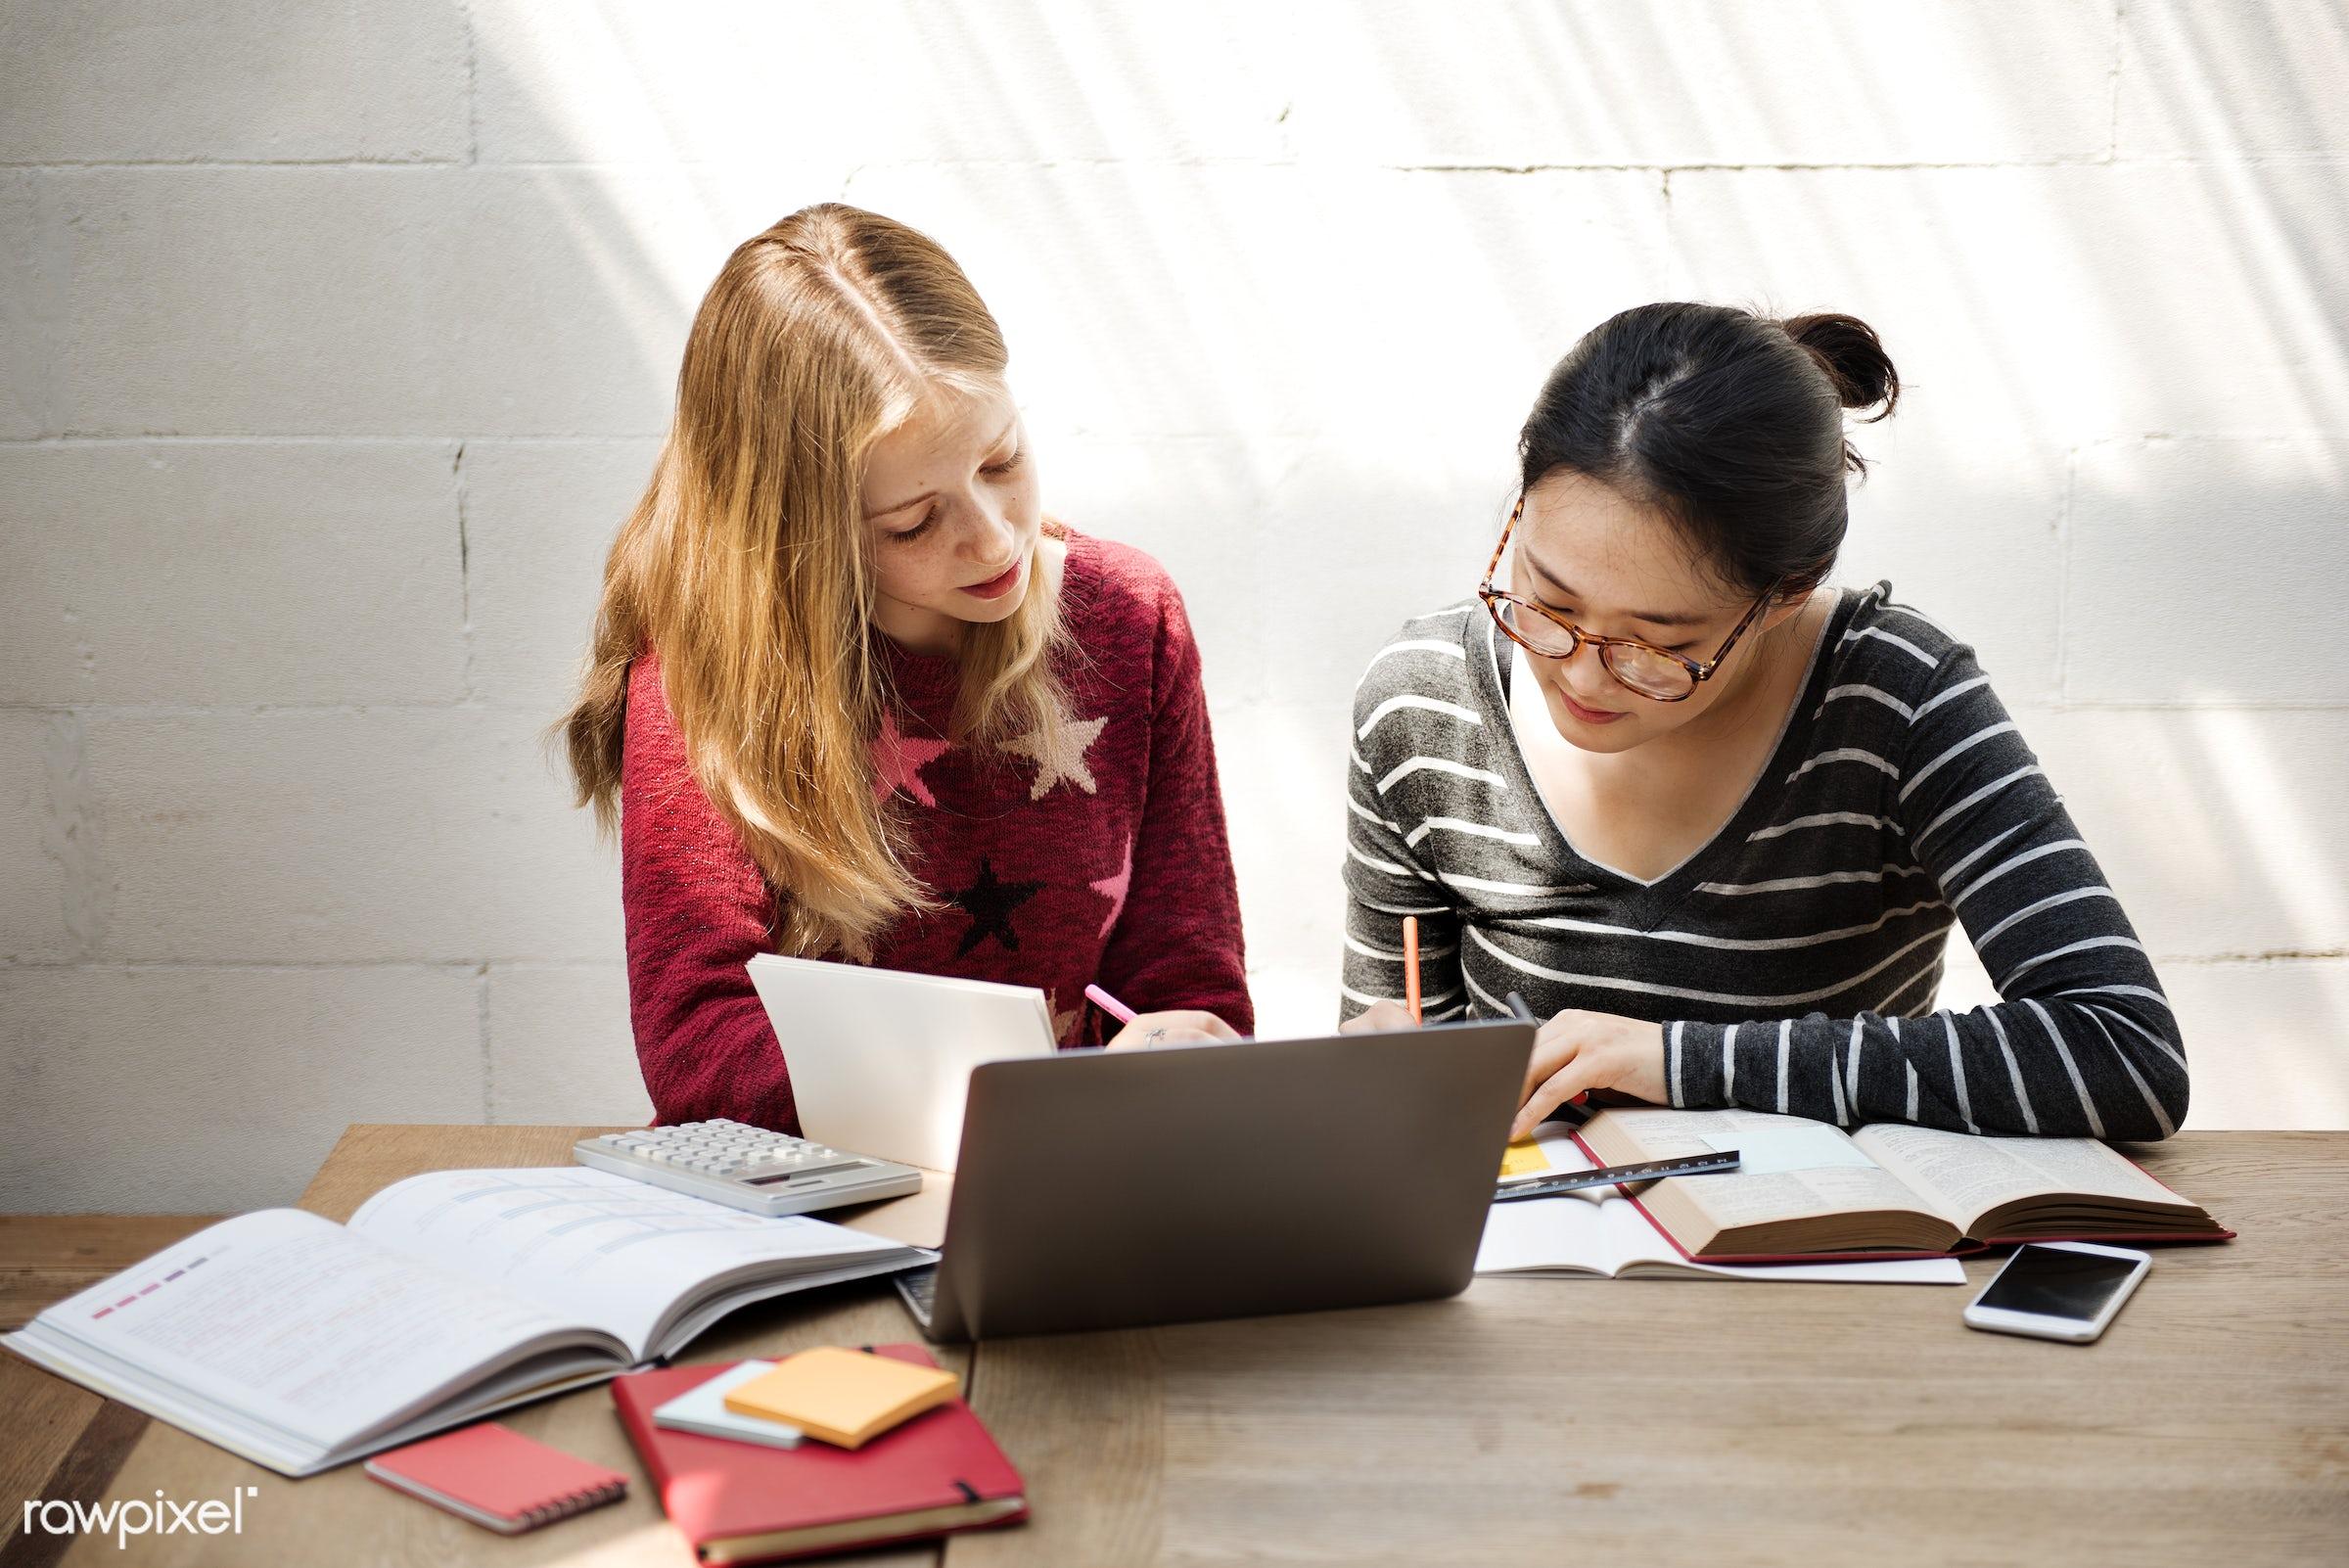 bonding, book, brainstorming, campus, casual, college, communication, connection, conversation, cooperation, data, digital,...